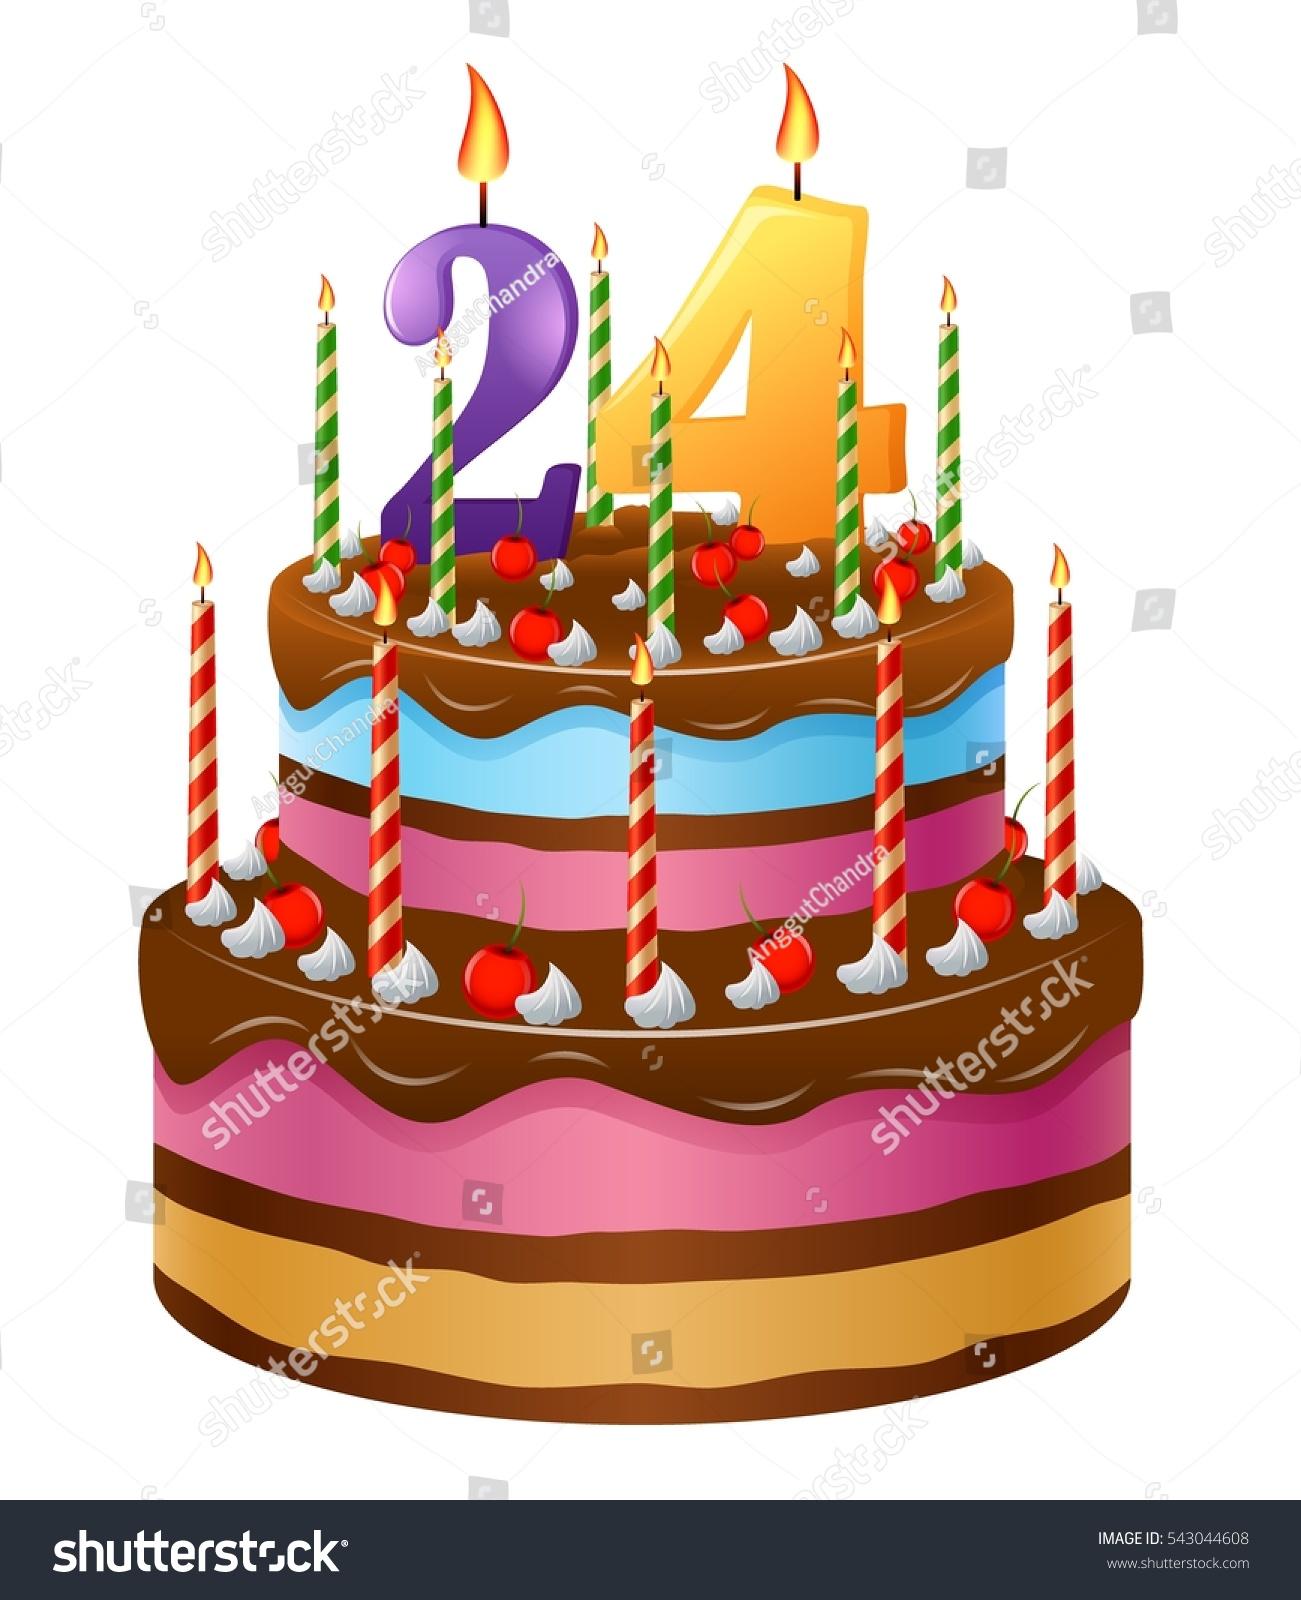 Happy Birthday Cake 24 Stock Illustration 543044608 Shutterstock